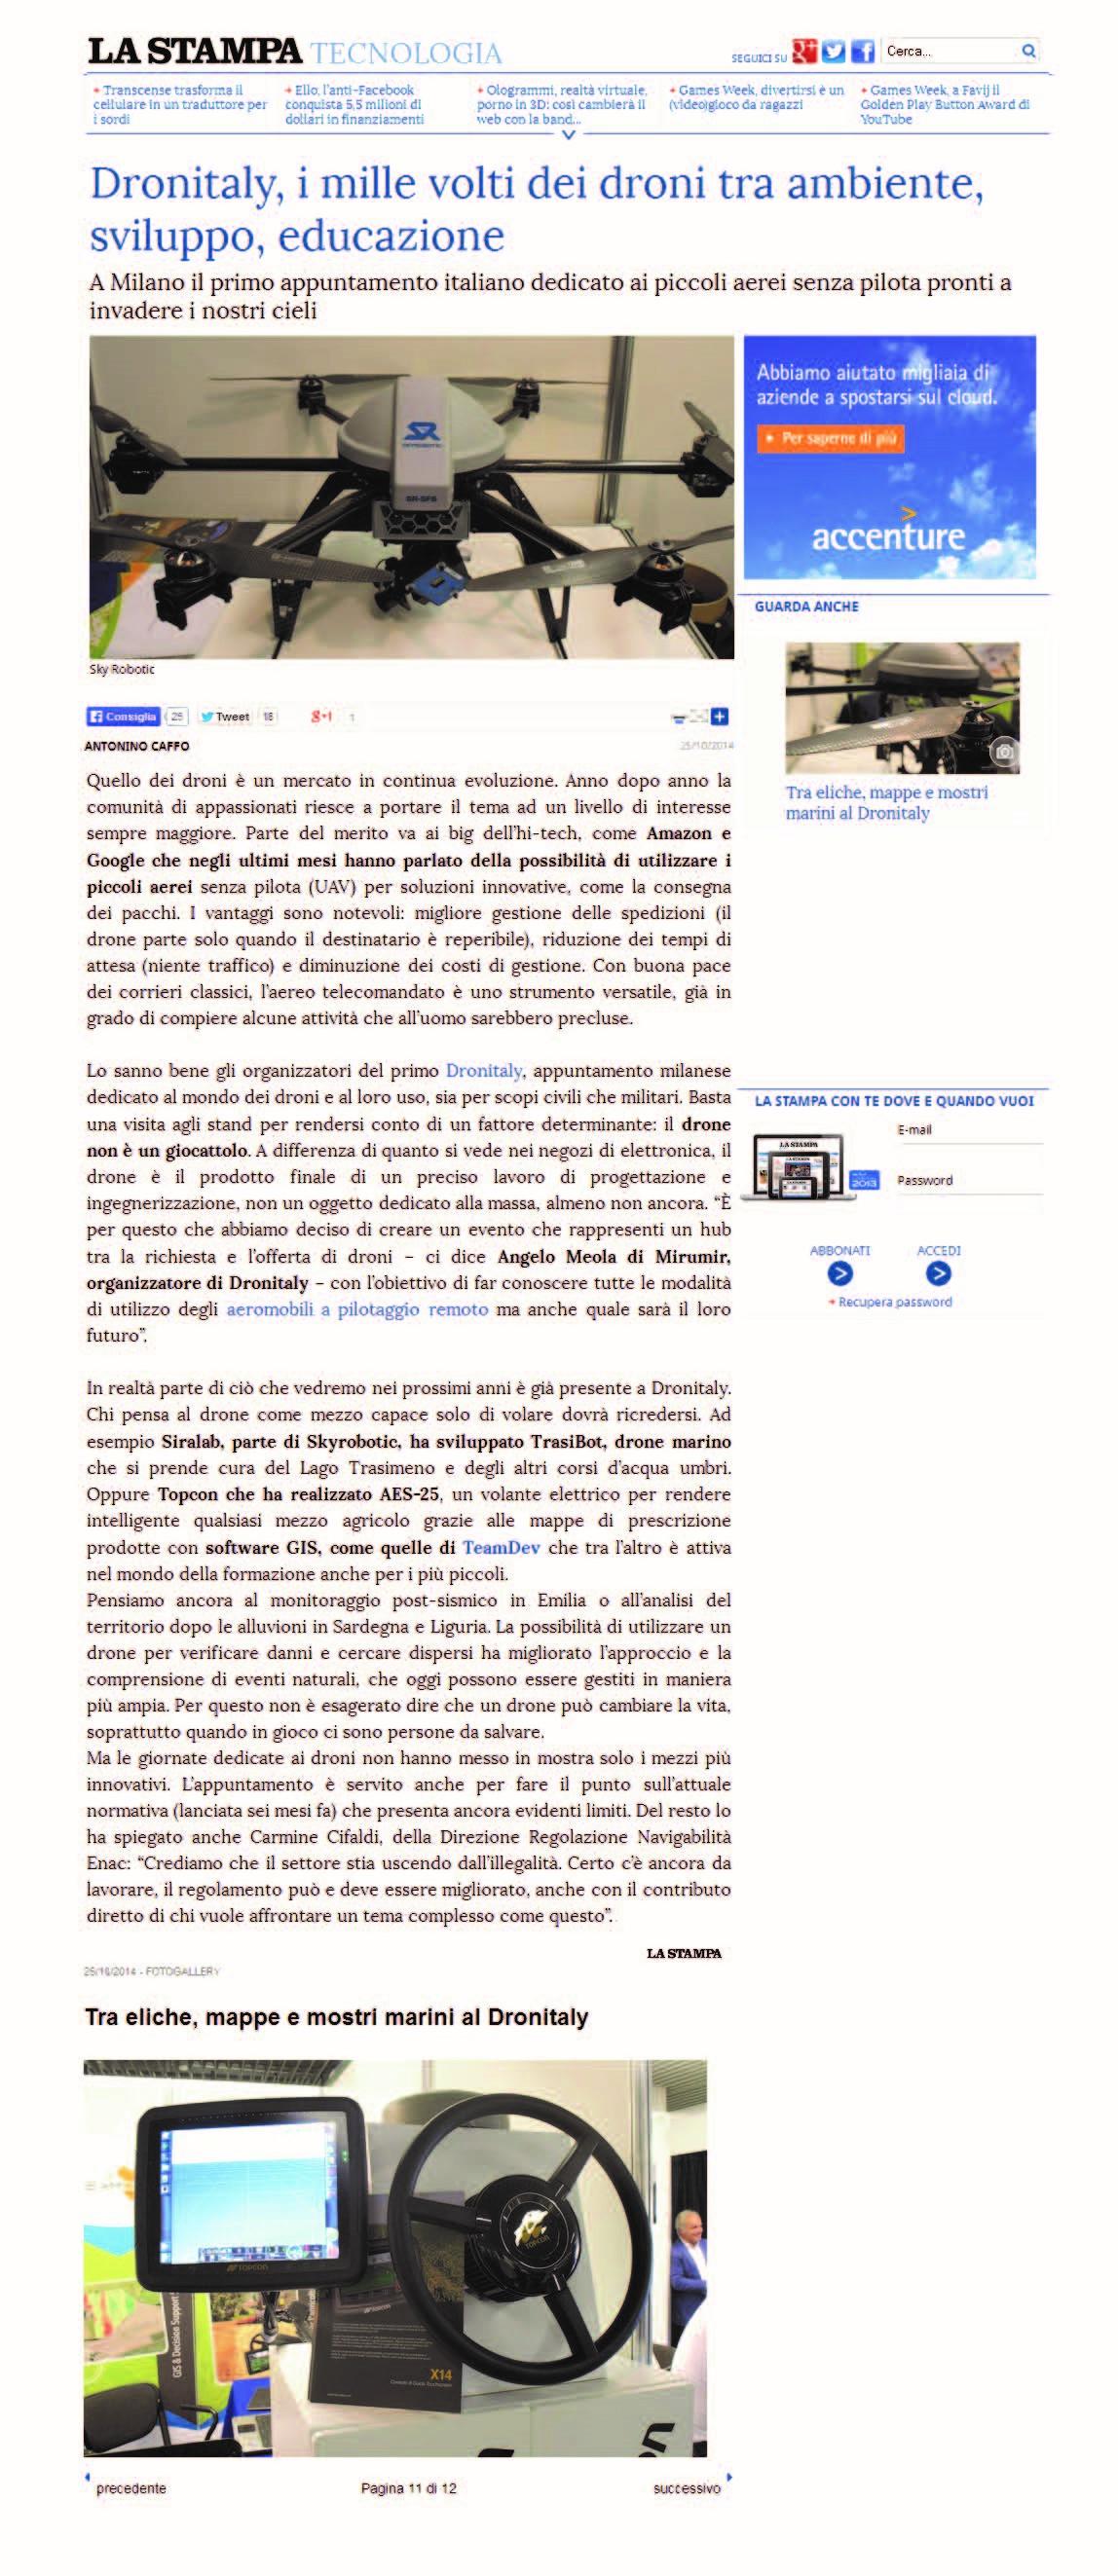 imag 8 blog agricolus